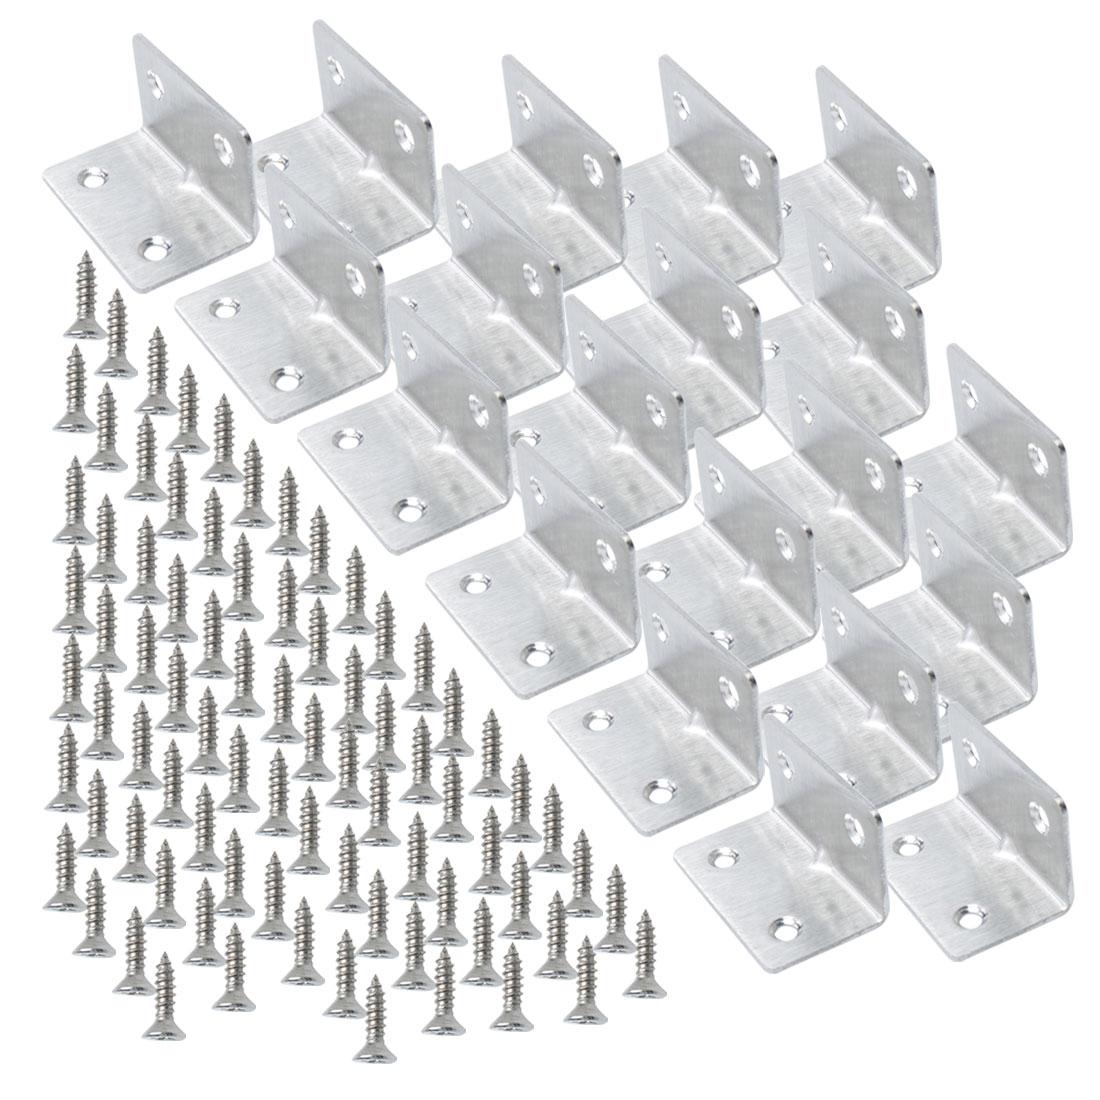 Angle Bracket Stainless Steel Corner Brace Support w Screw 30 x 30 x 50mm, 20pcs